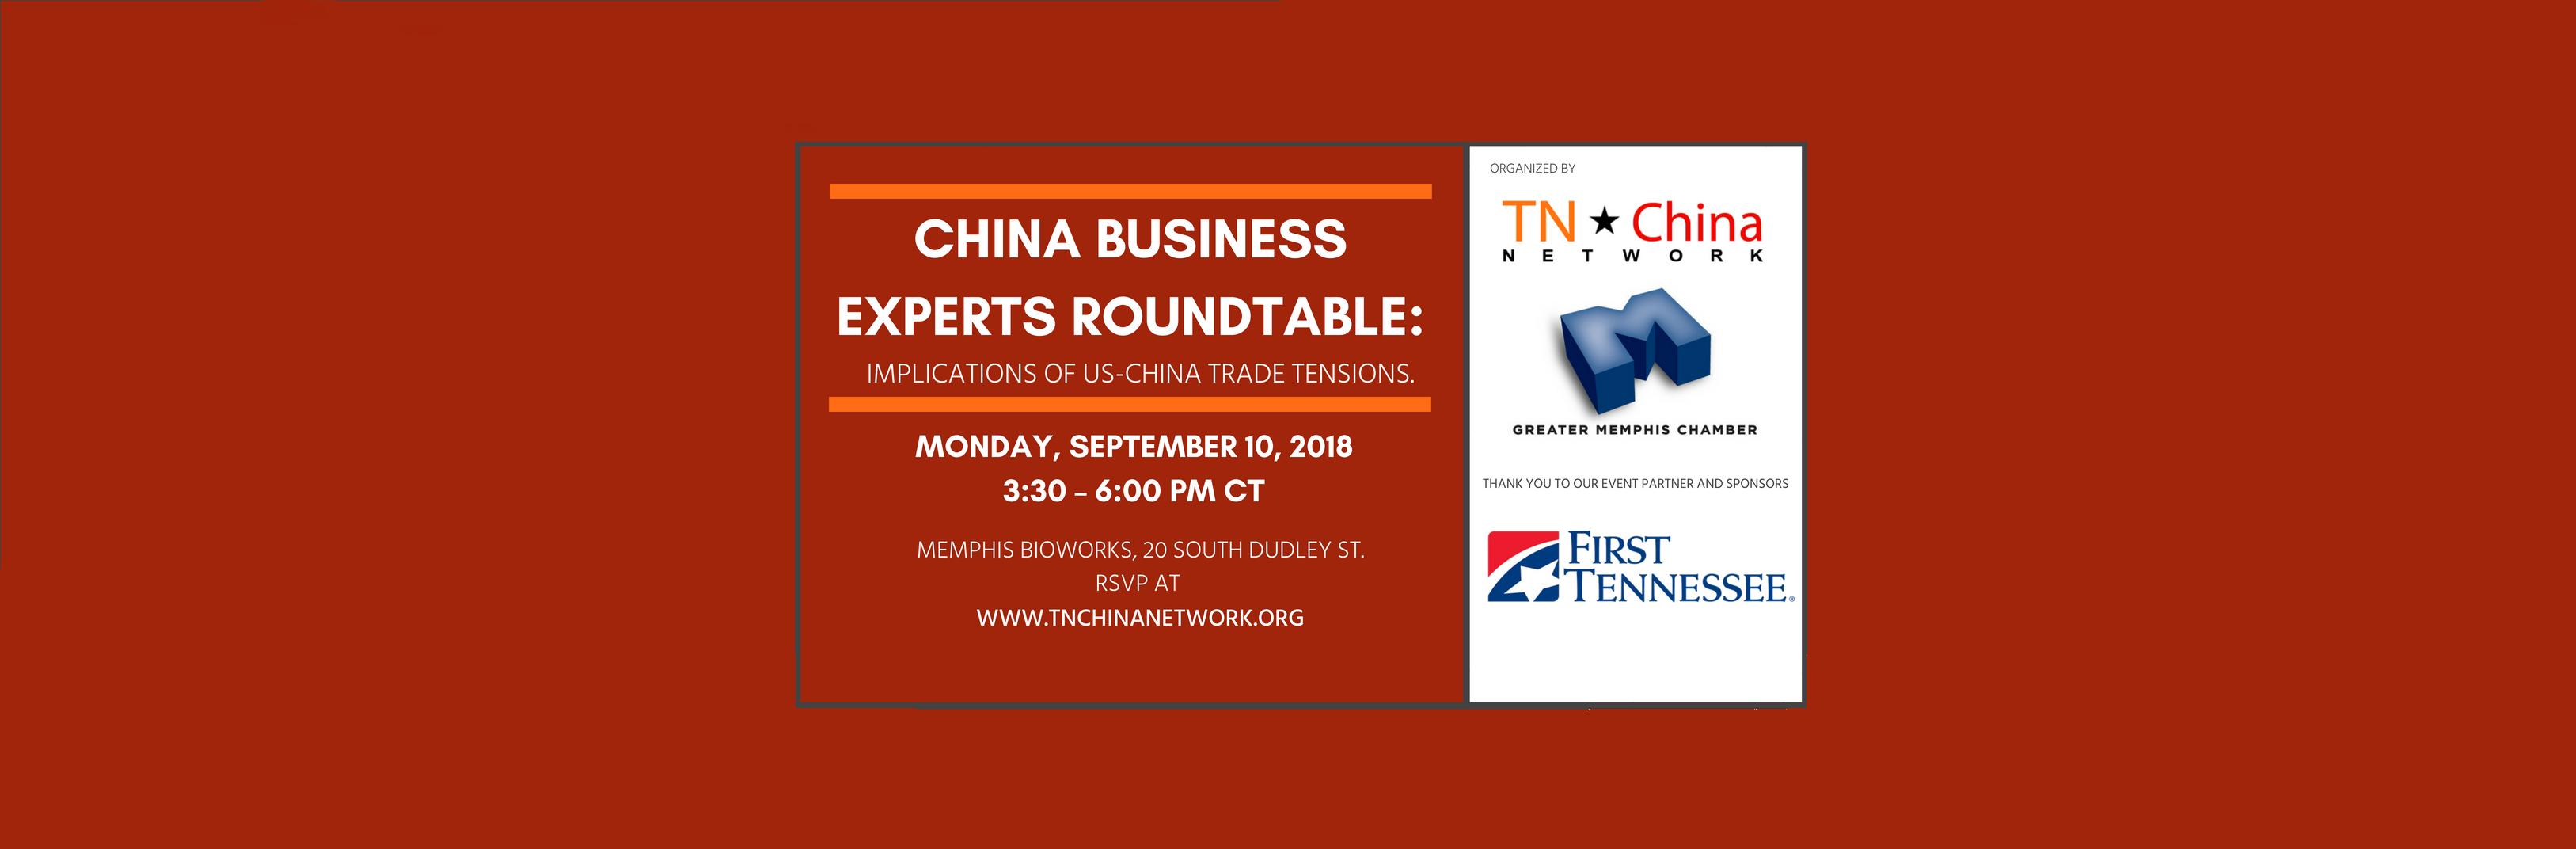 2018-09-10 China Business Experts Roundtable Memphis Slider v1